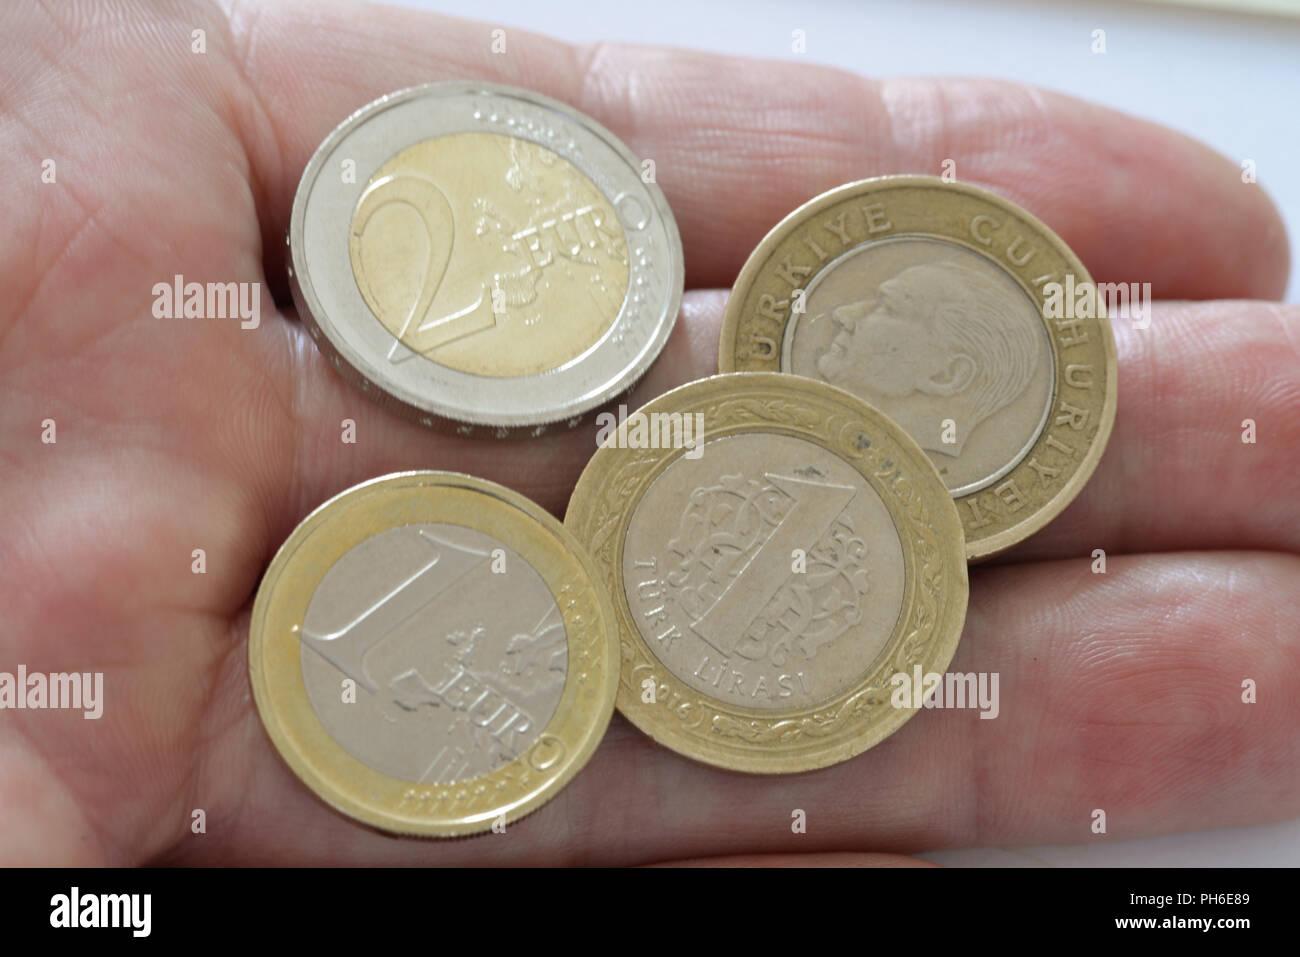 Euromuenzen Tuerkische Lira Muenzen Stock Photo 217116489 Alamy